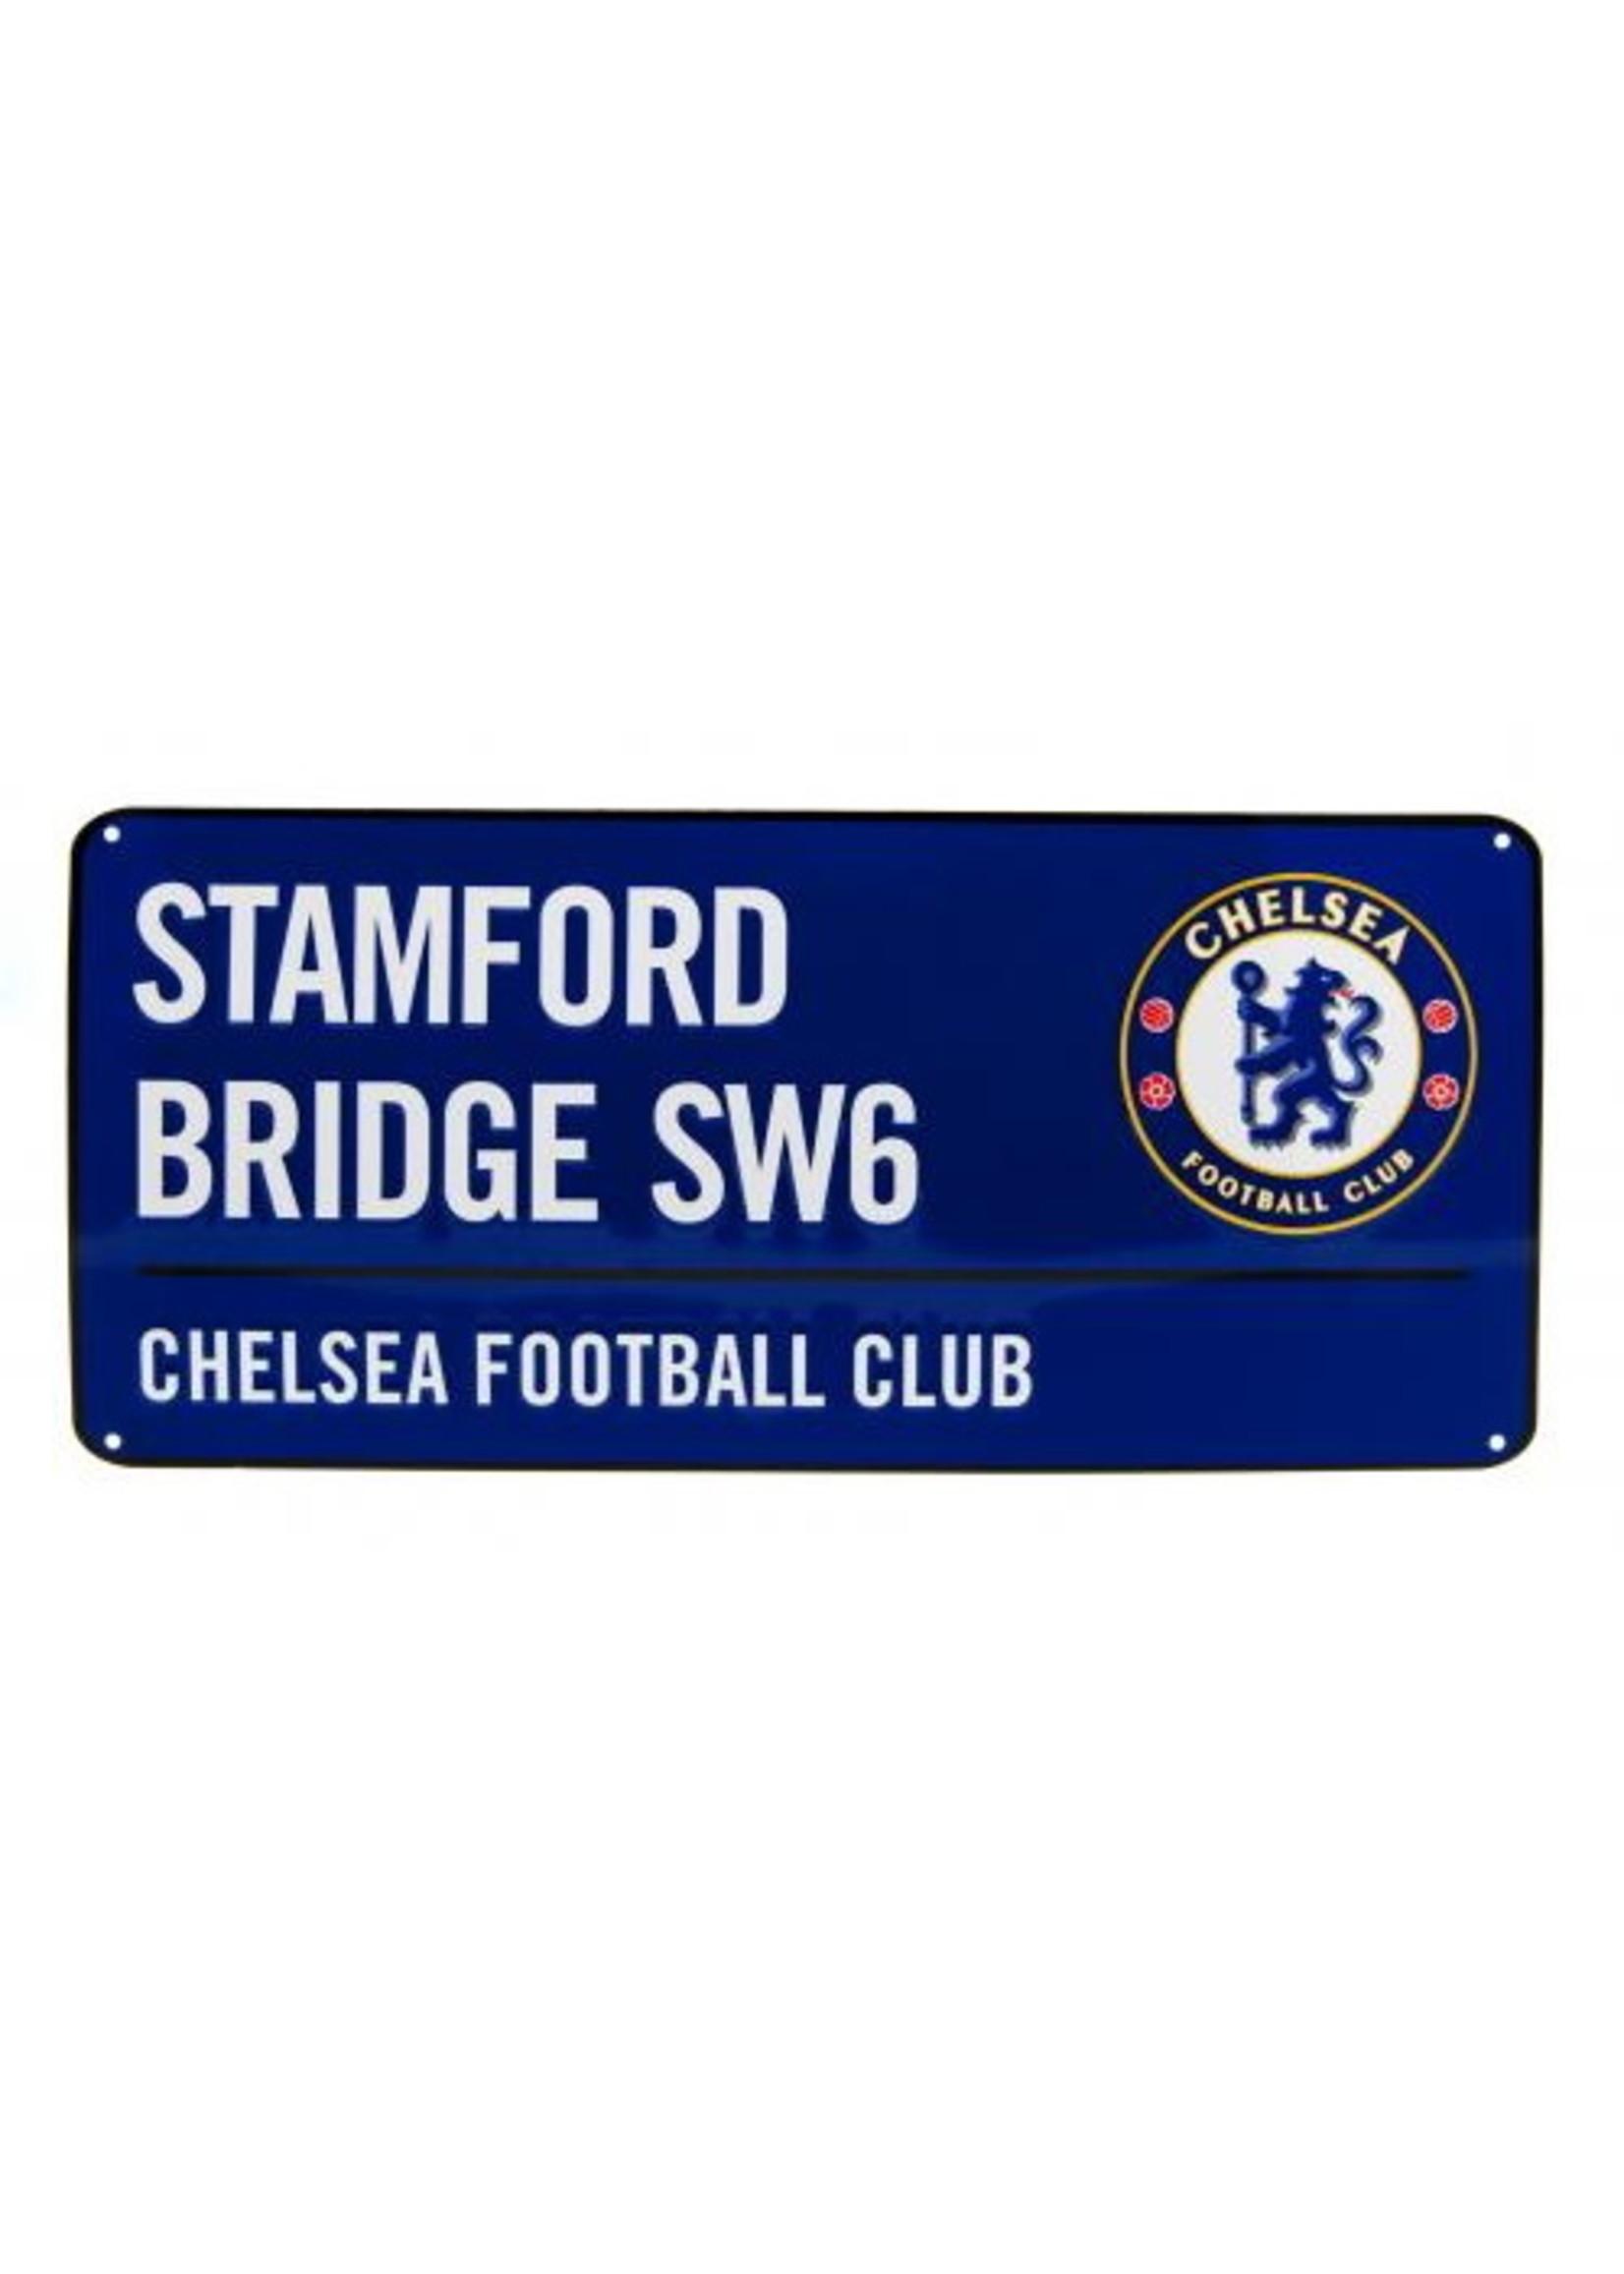 Chelsea Stamford Bridge SW6 Street Sign - Blue